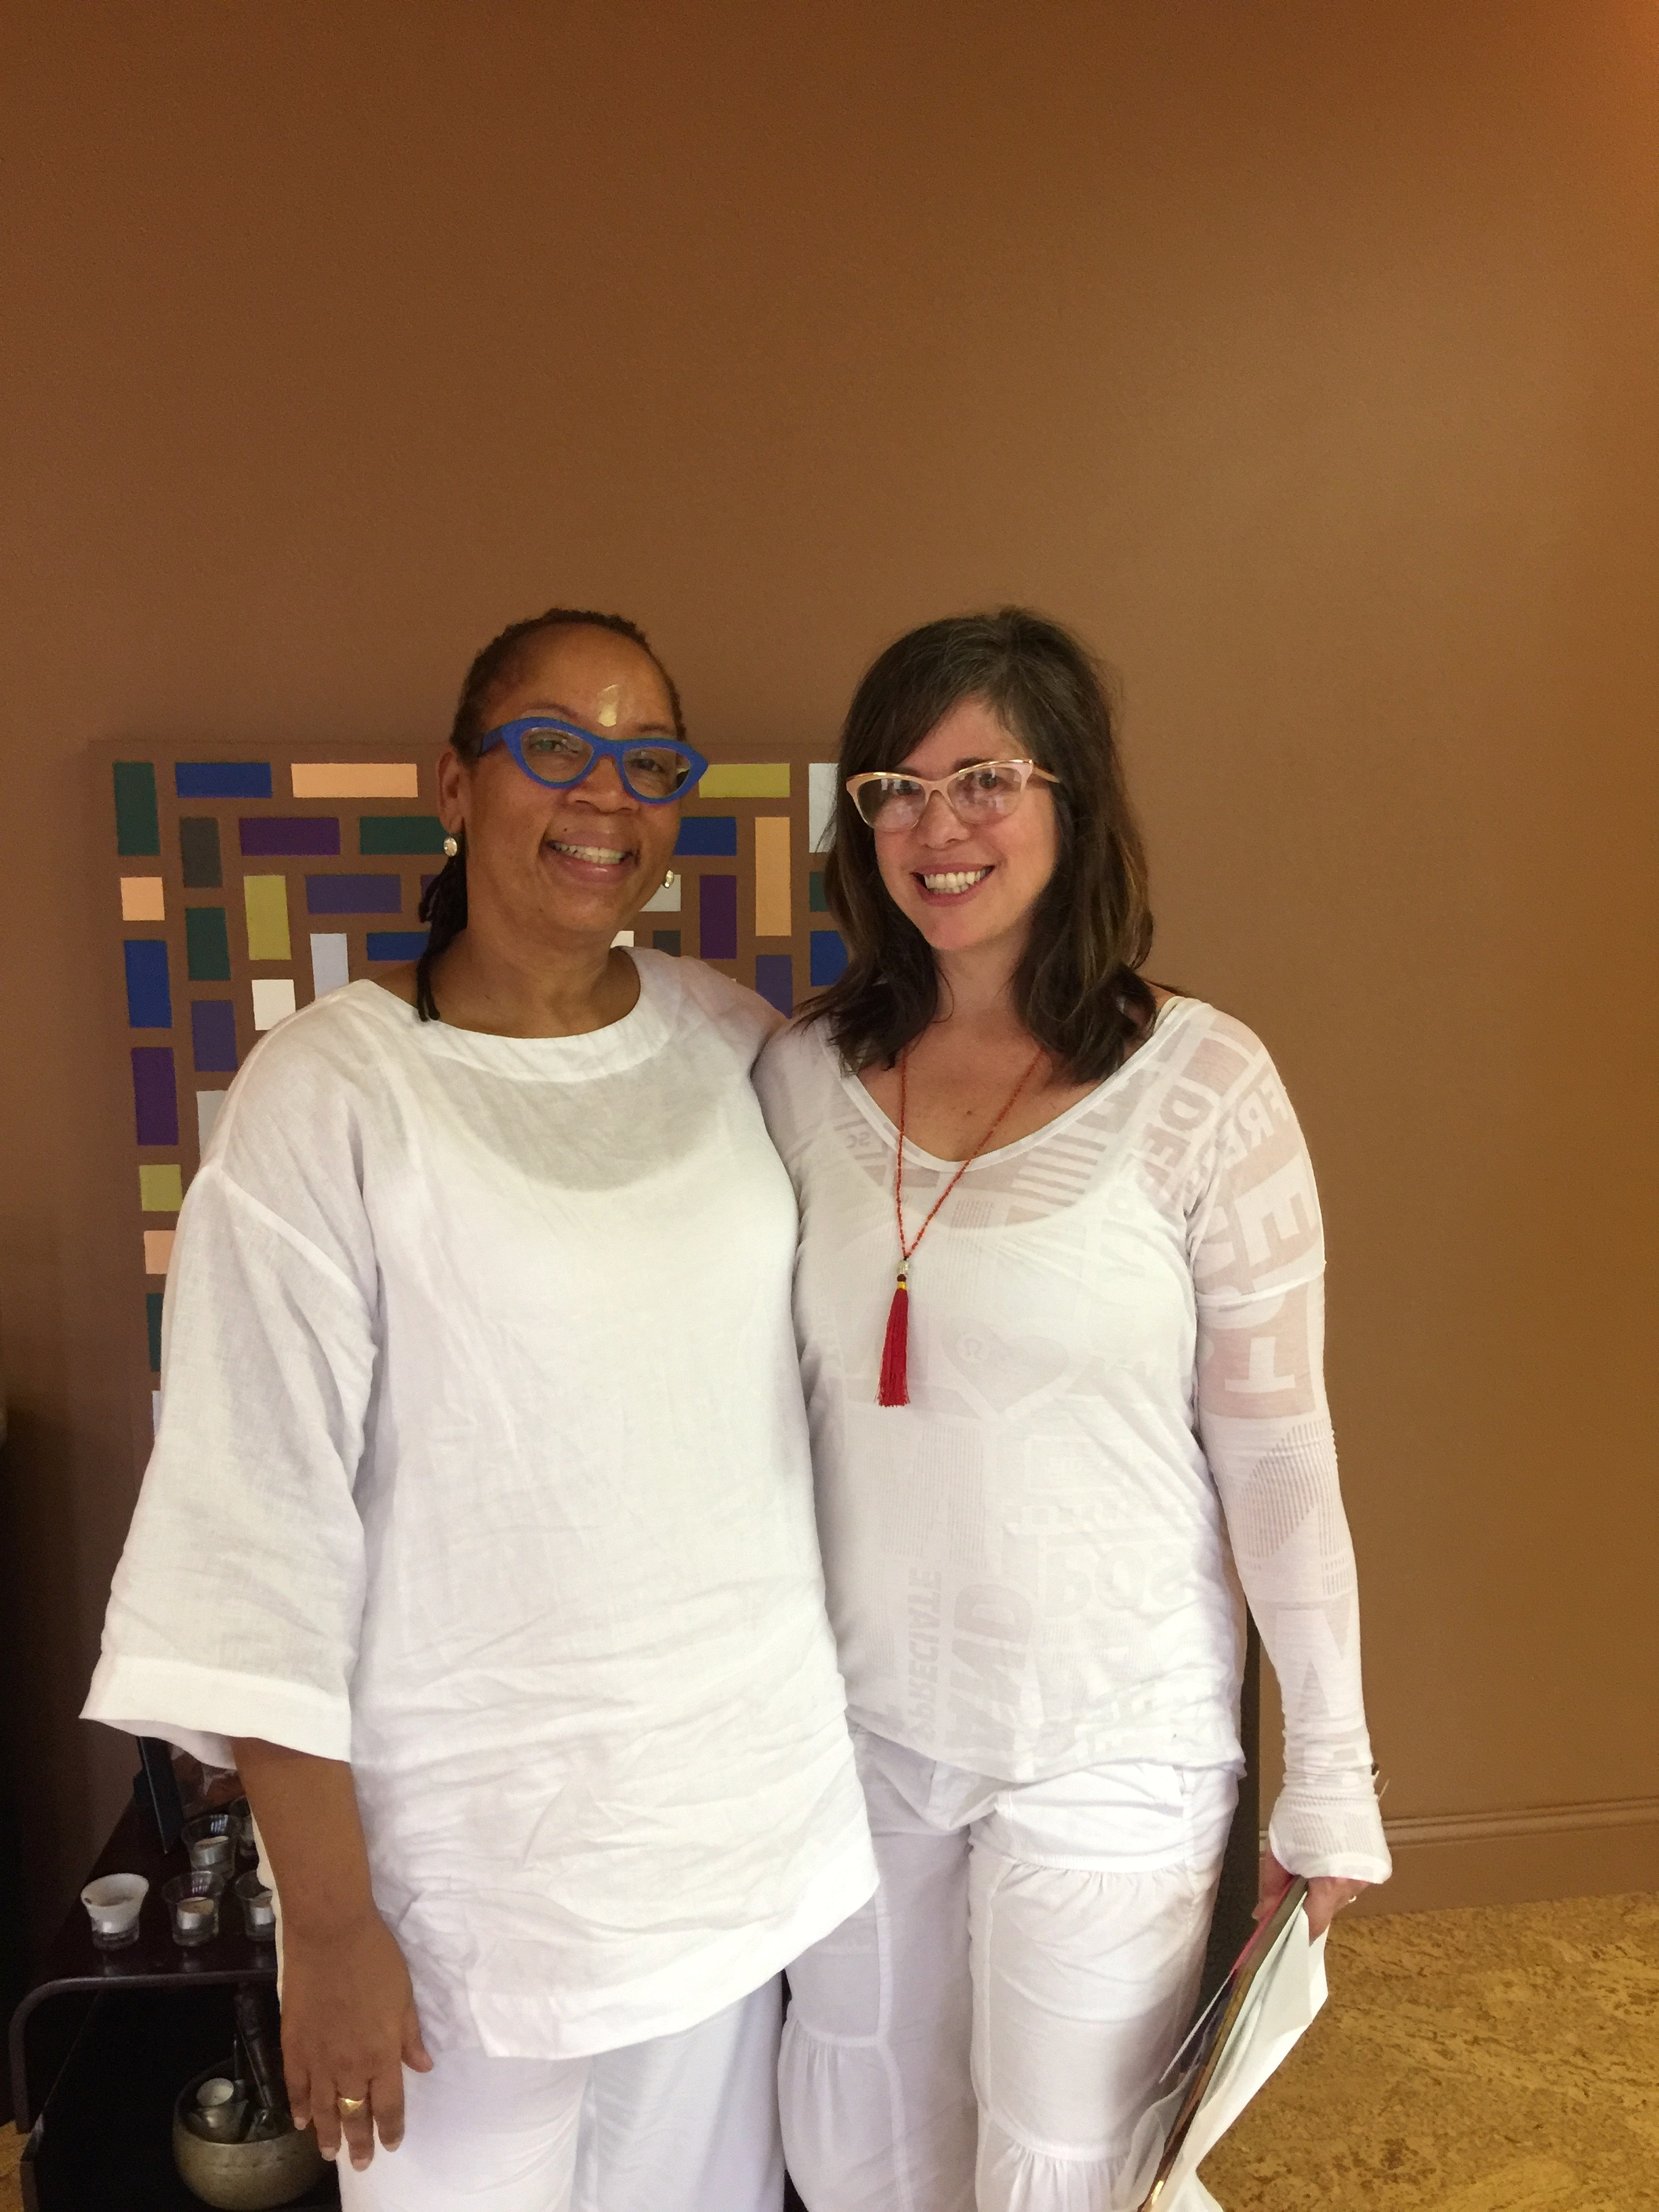 Anne Falkowski and Shelley Best on Yoga Teacher Training Graduation Day